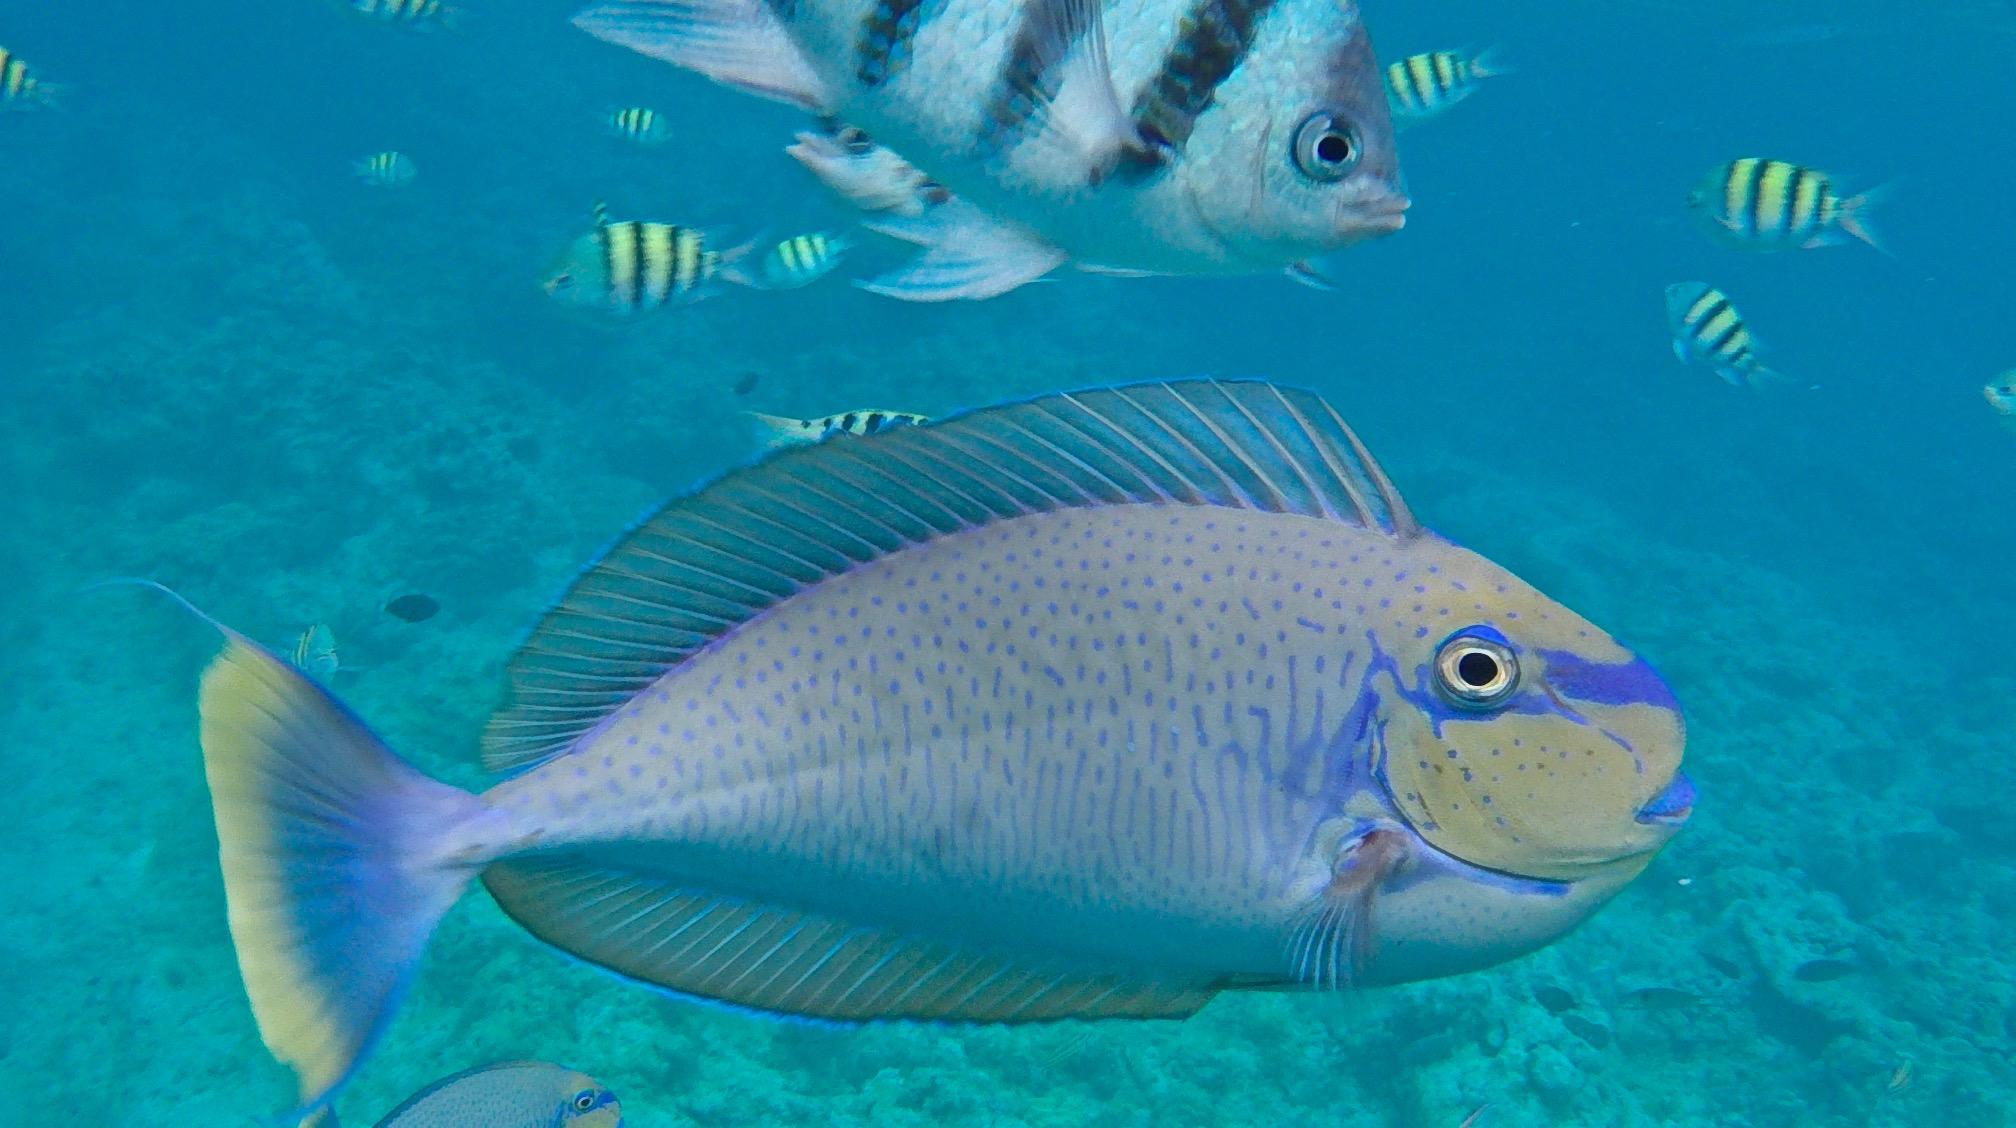 Viele Fisch-Erfolgsgeschichten